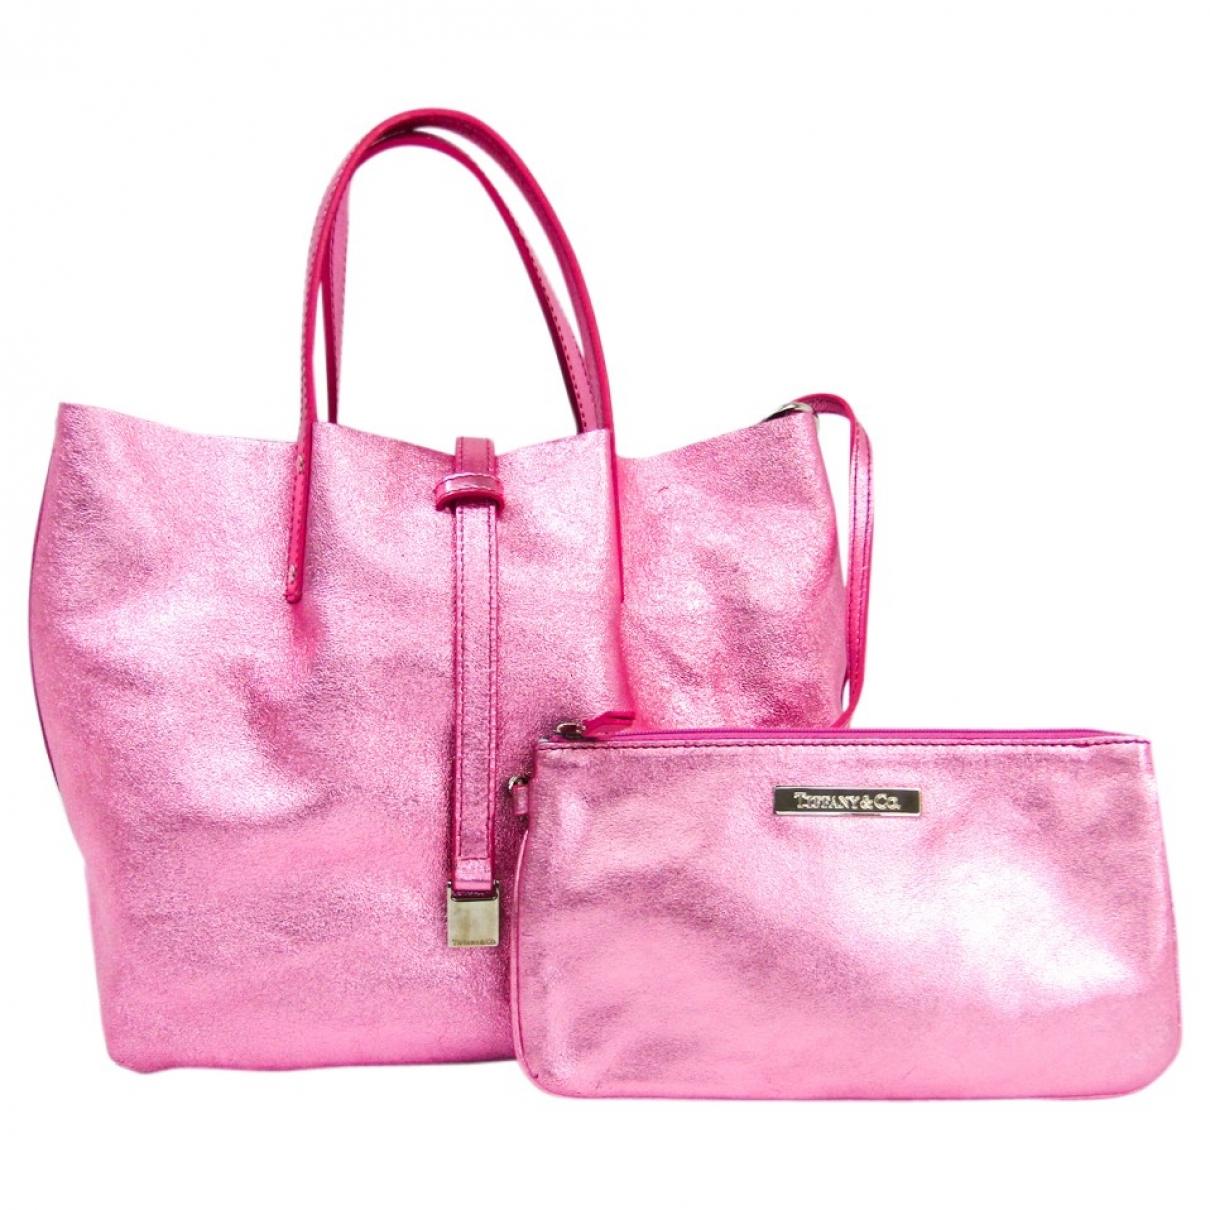 Tiffany & Co \N Pink Leather handbag for Women \N